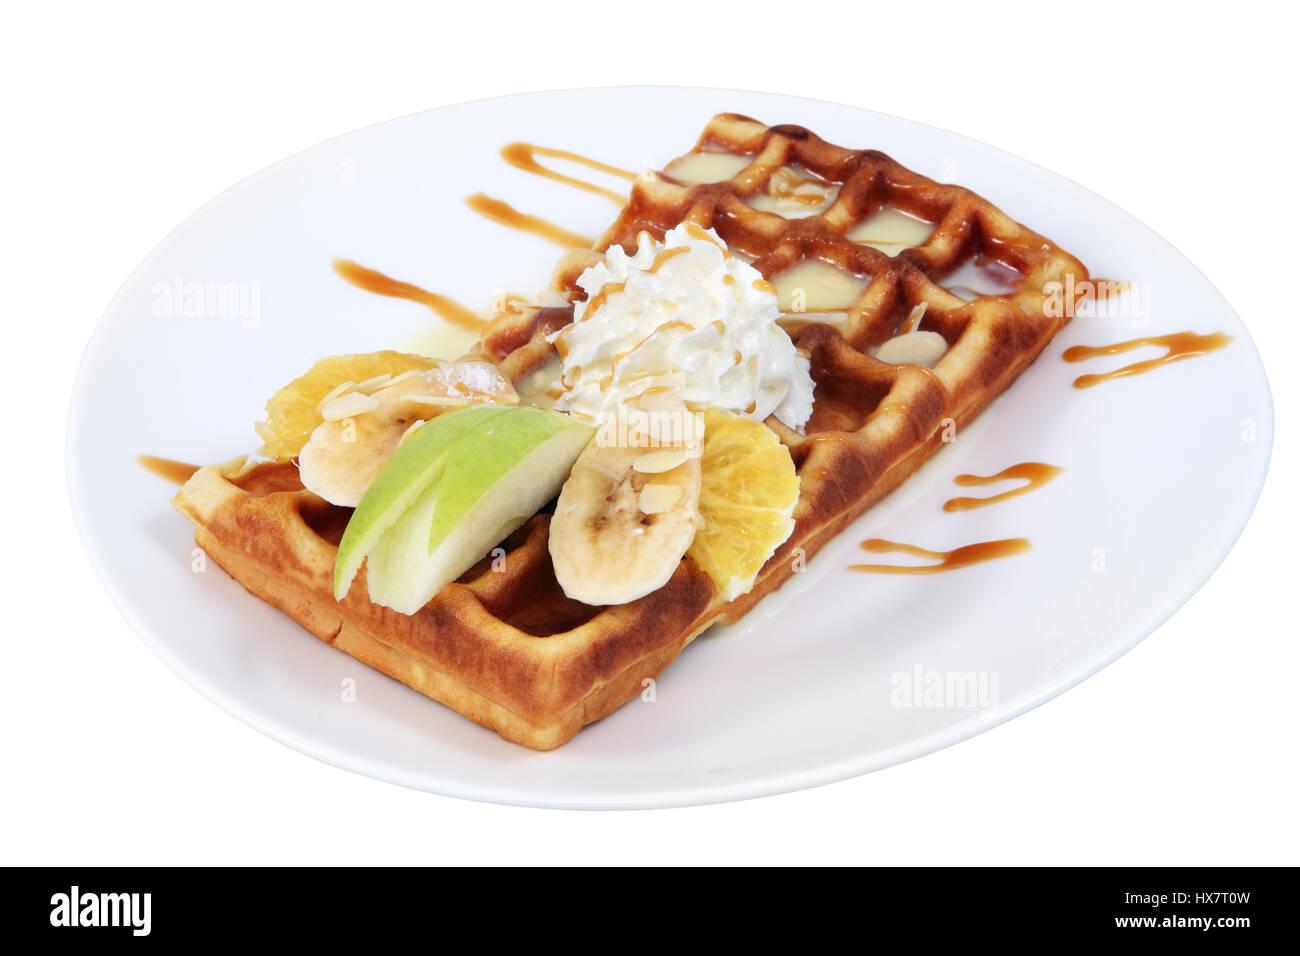 Dessert dish, Belgian waffle with condensed milk, whipped cream and slices of fruit, banana, apple, orange, put - Stock Image